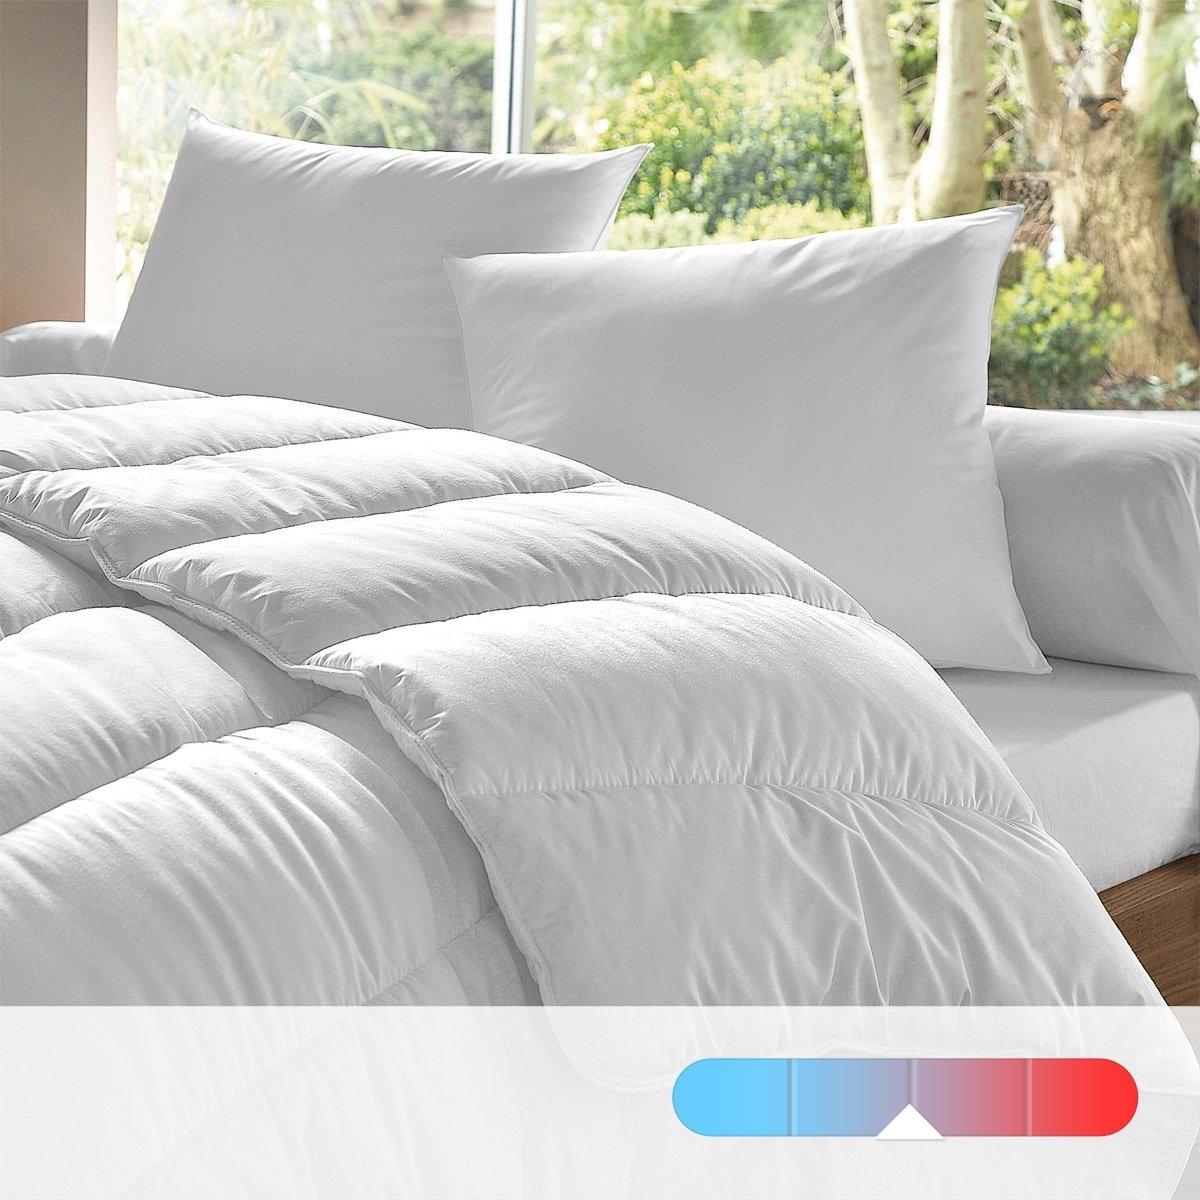 Одеяло из синтетики, 300 г/м²